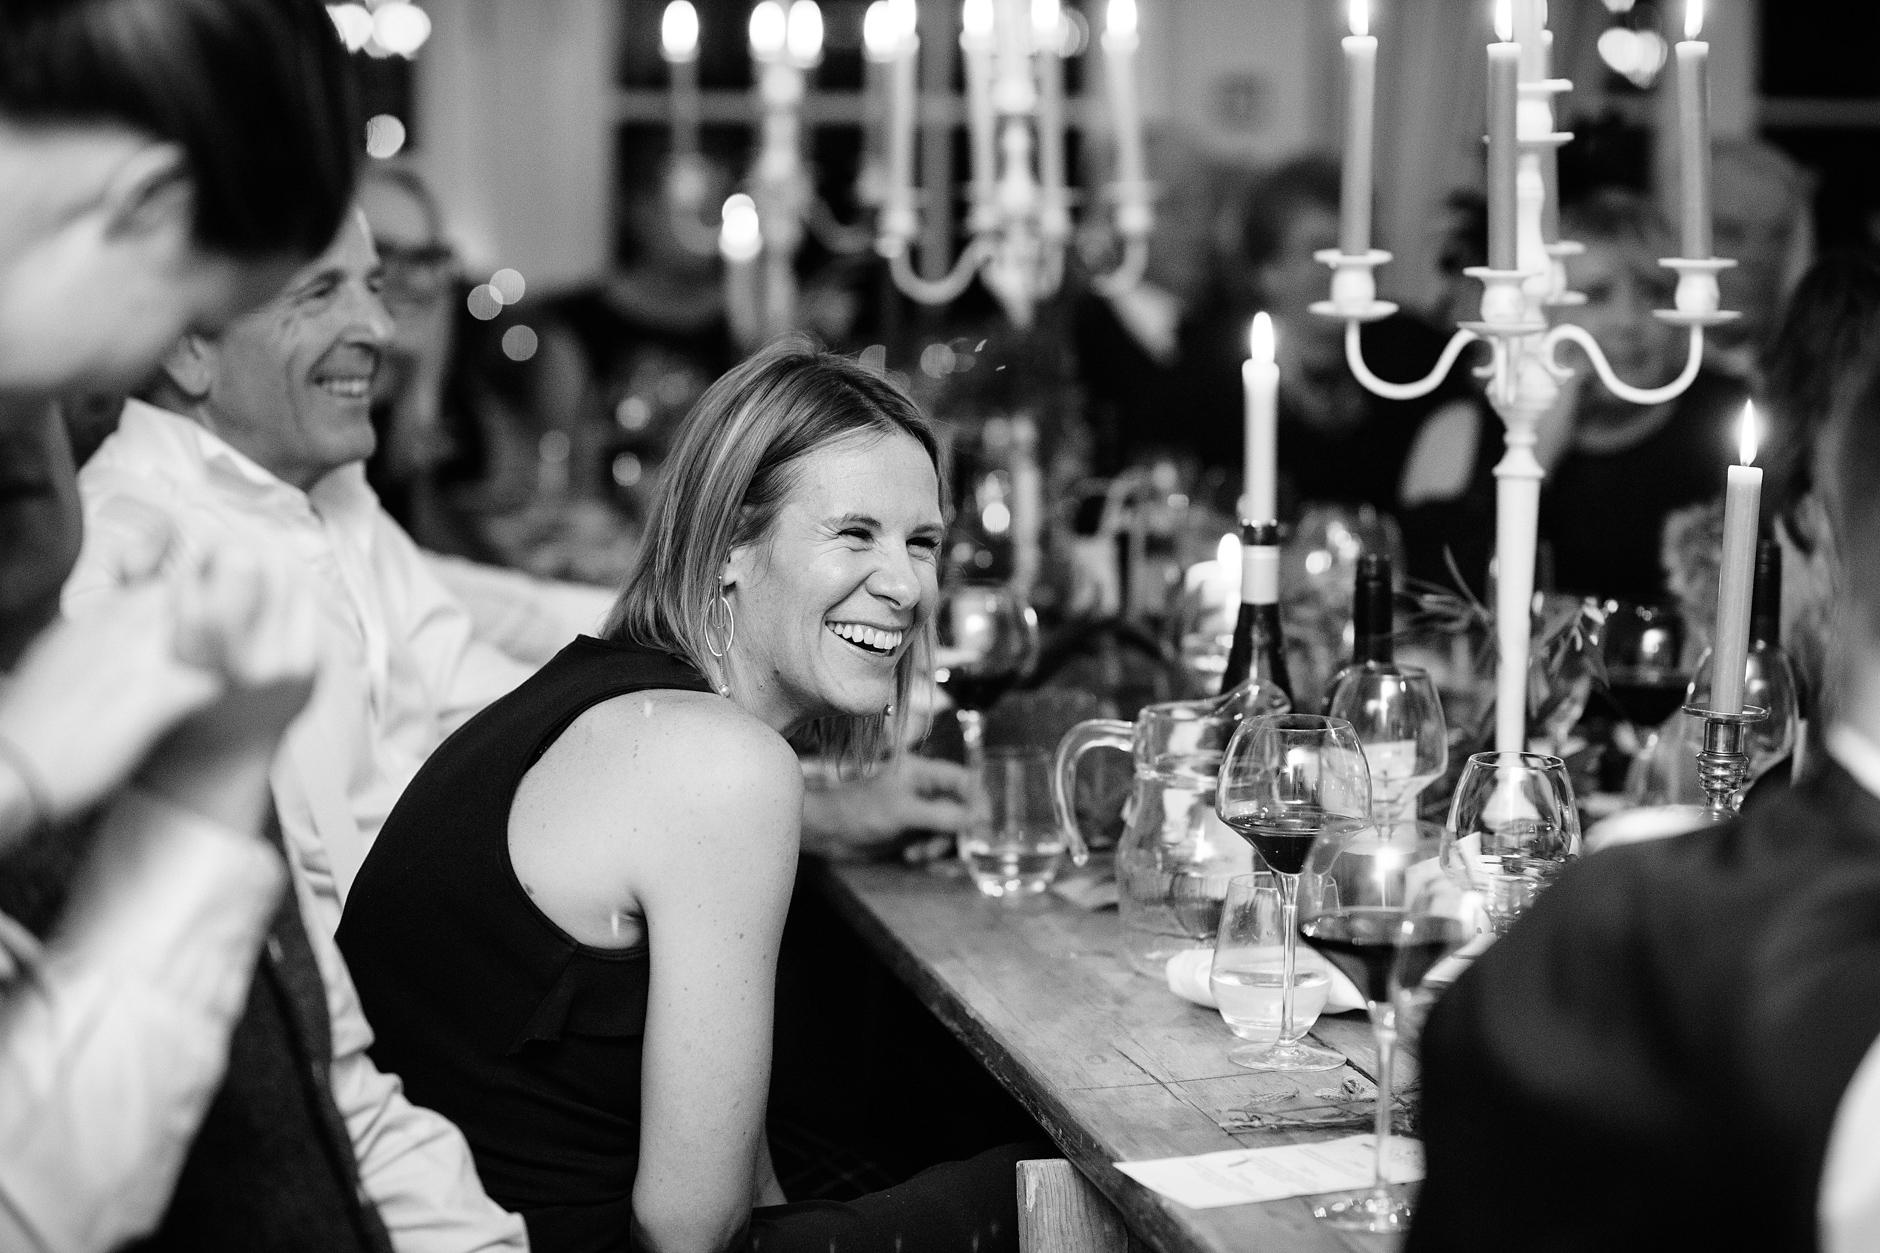 Glentruim-Wedding-Nikki-Leadbetter-Photography-306.jpg